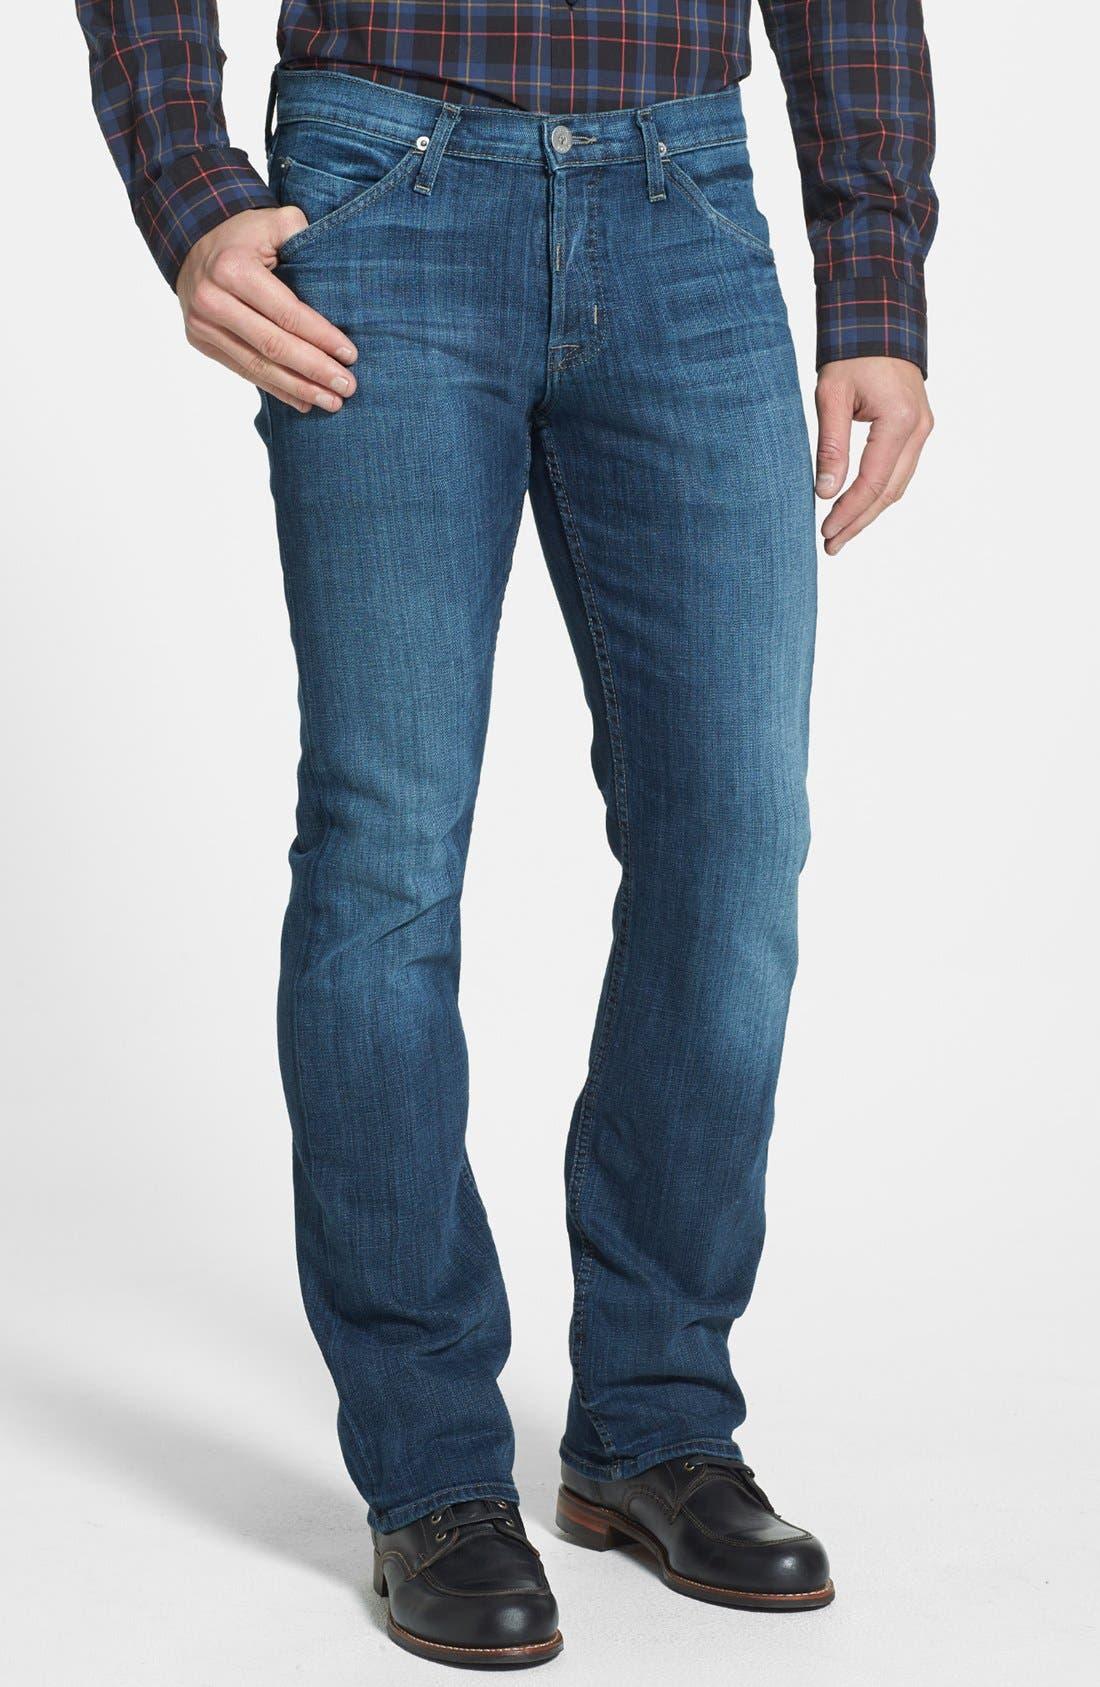 Main Image - Hudson Jeans 'Webber' Bootcut Jeans (Harris) (Online Exclusive)